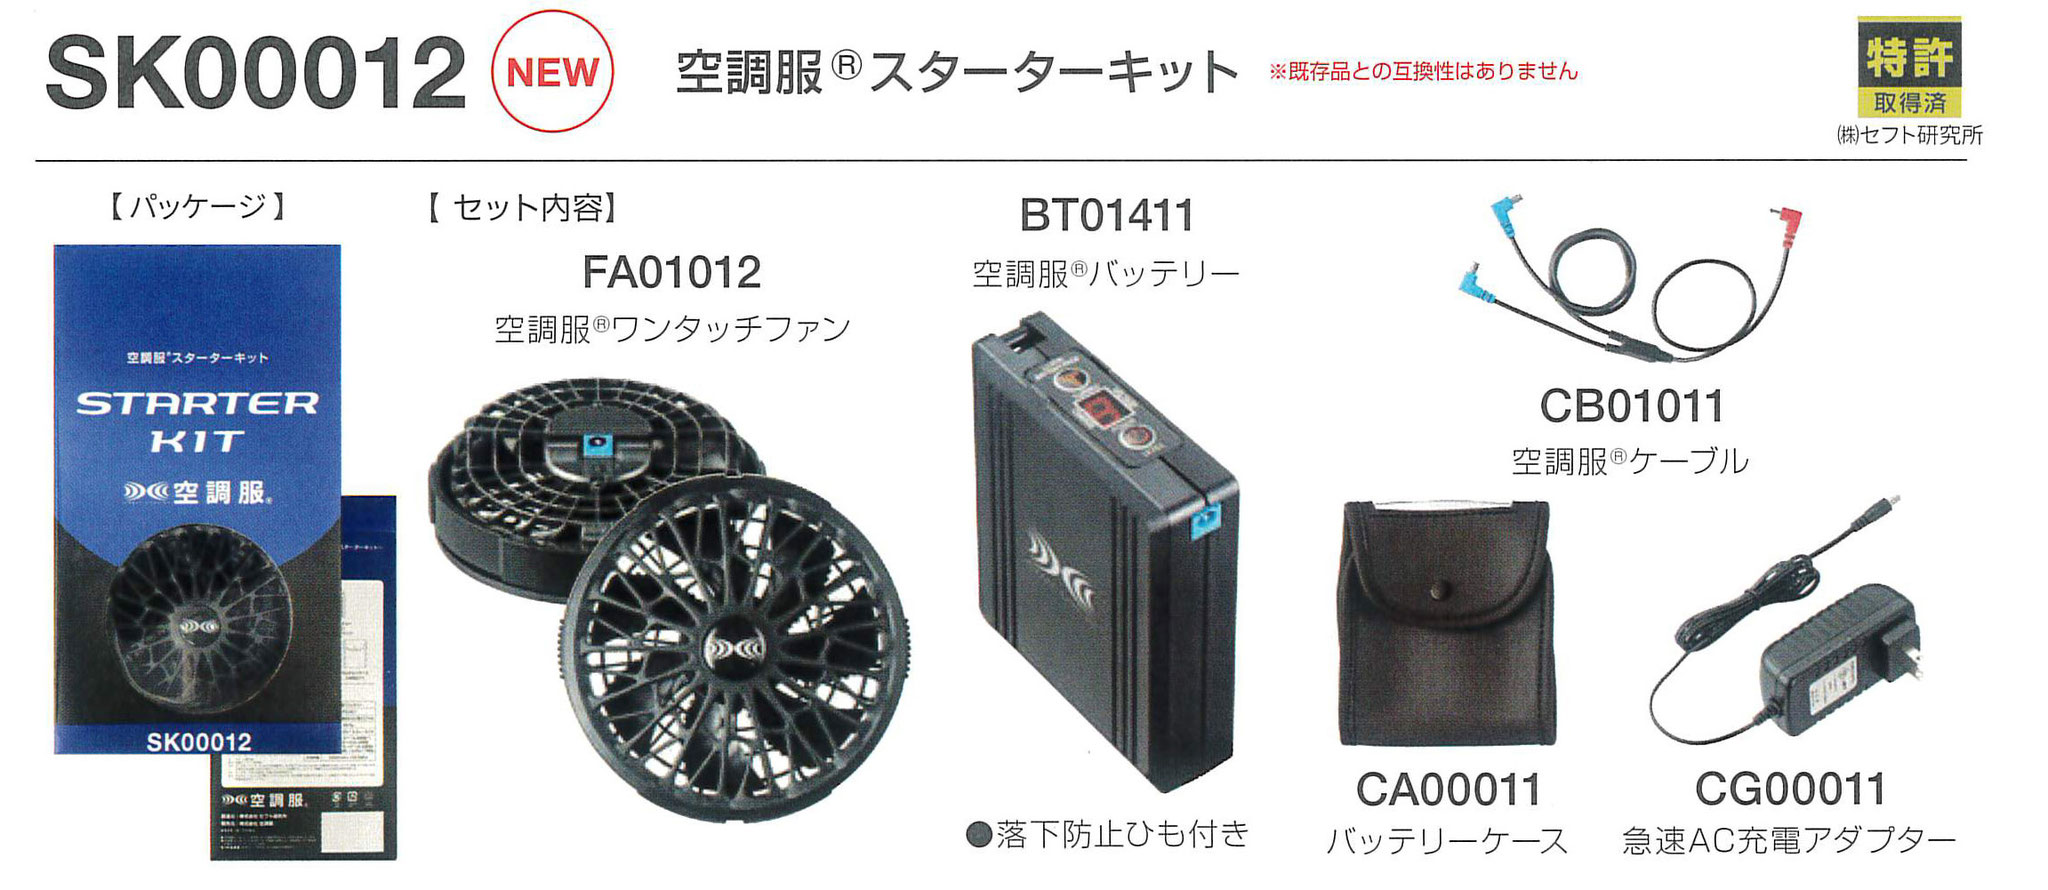 SK00012 空調服14.4V スターターキット¥19,900(税込)